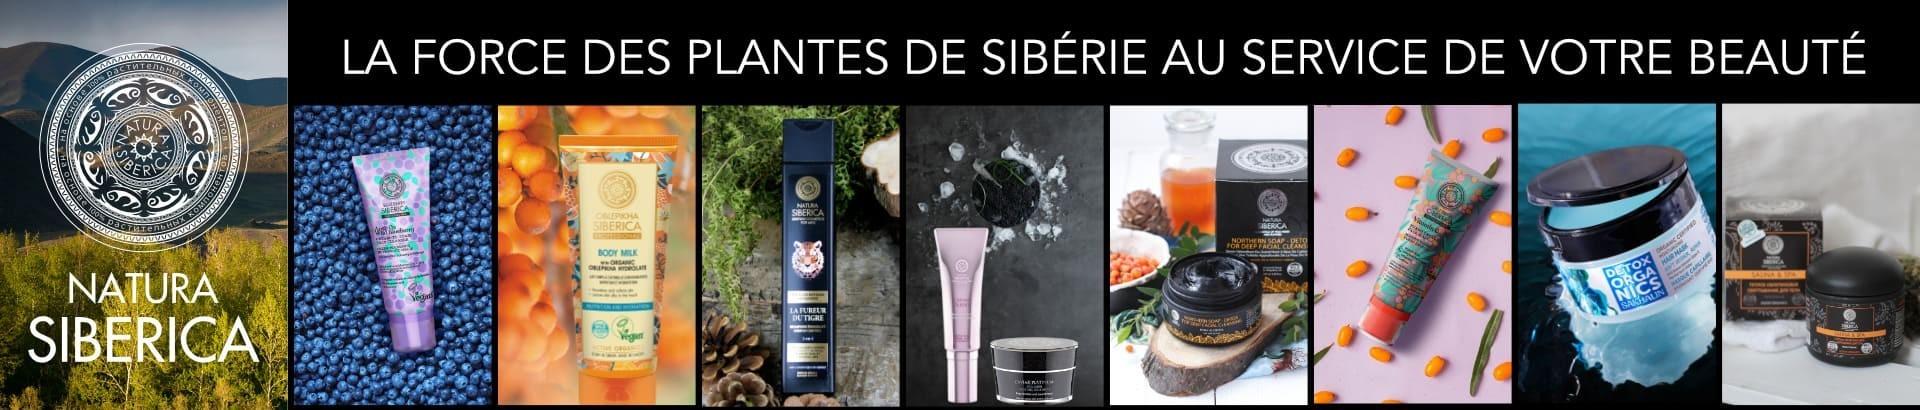 France Maia - NATURA SIBERICA soins visage, corps et cheveux